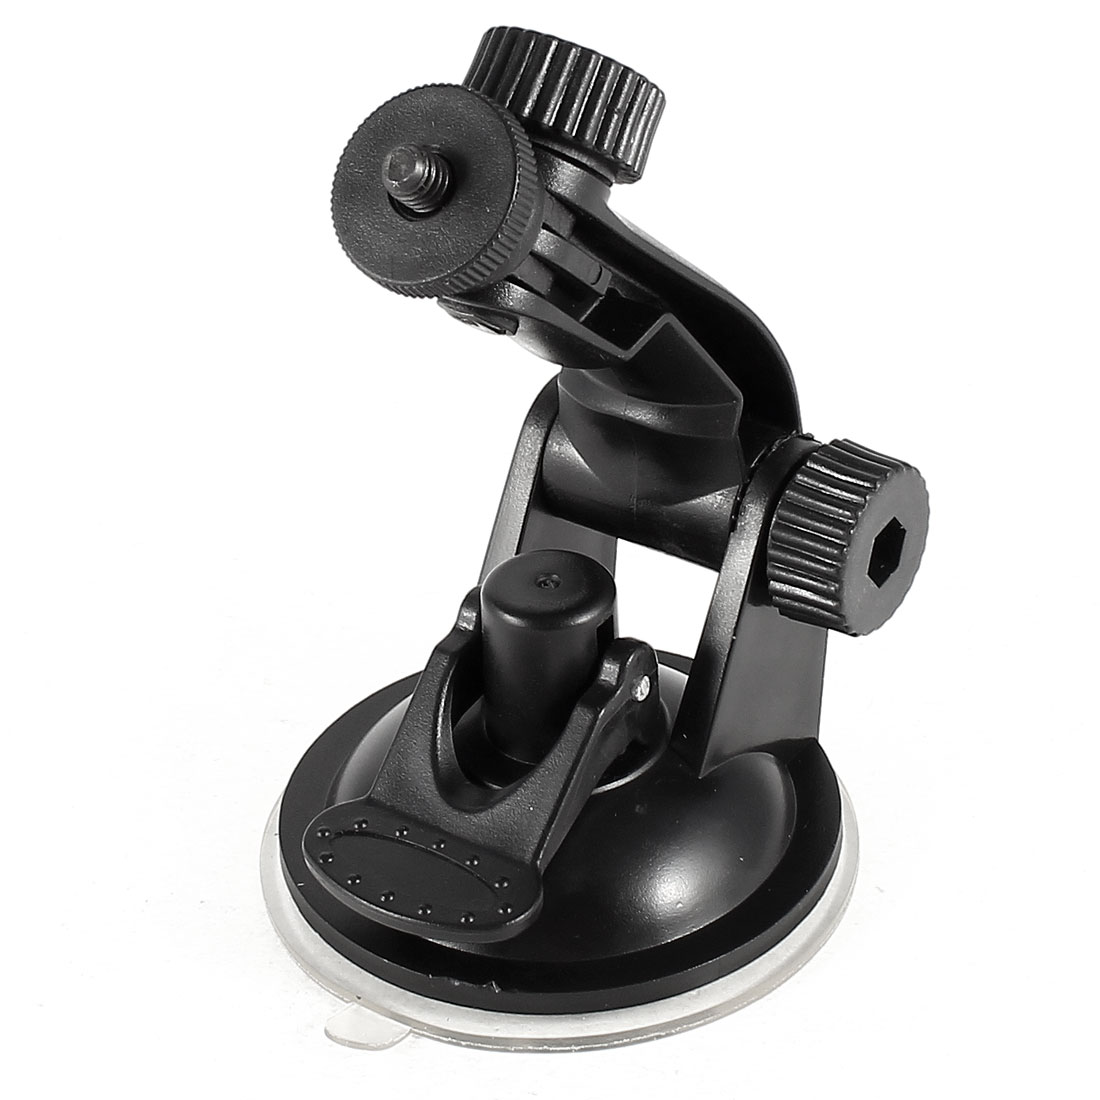 Unique Bargains Black Suction Cup Stand Bracket Car Windshield Dashboard Camera Mount